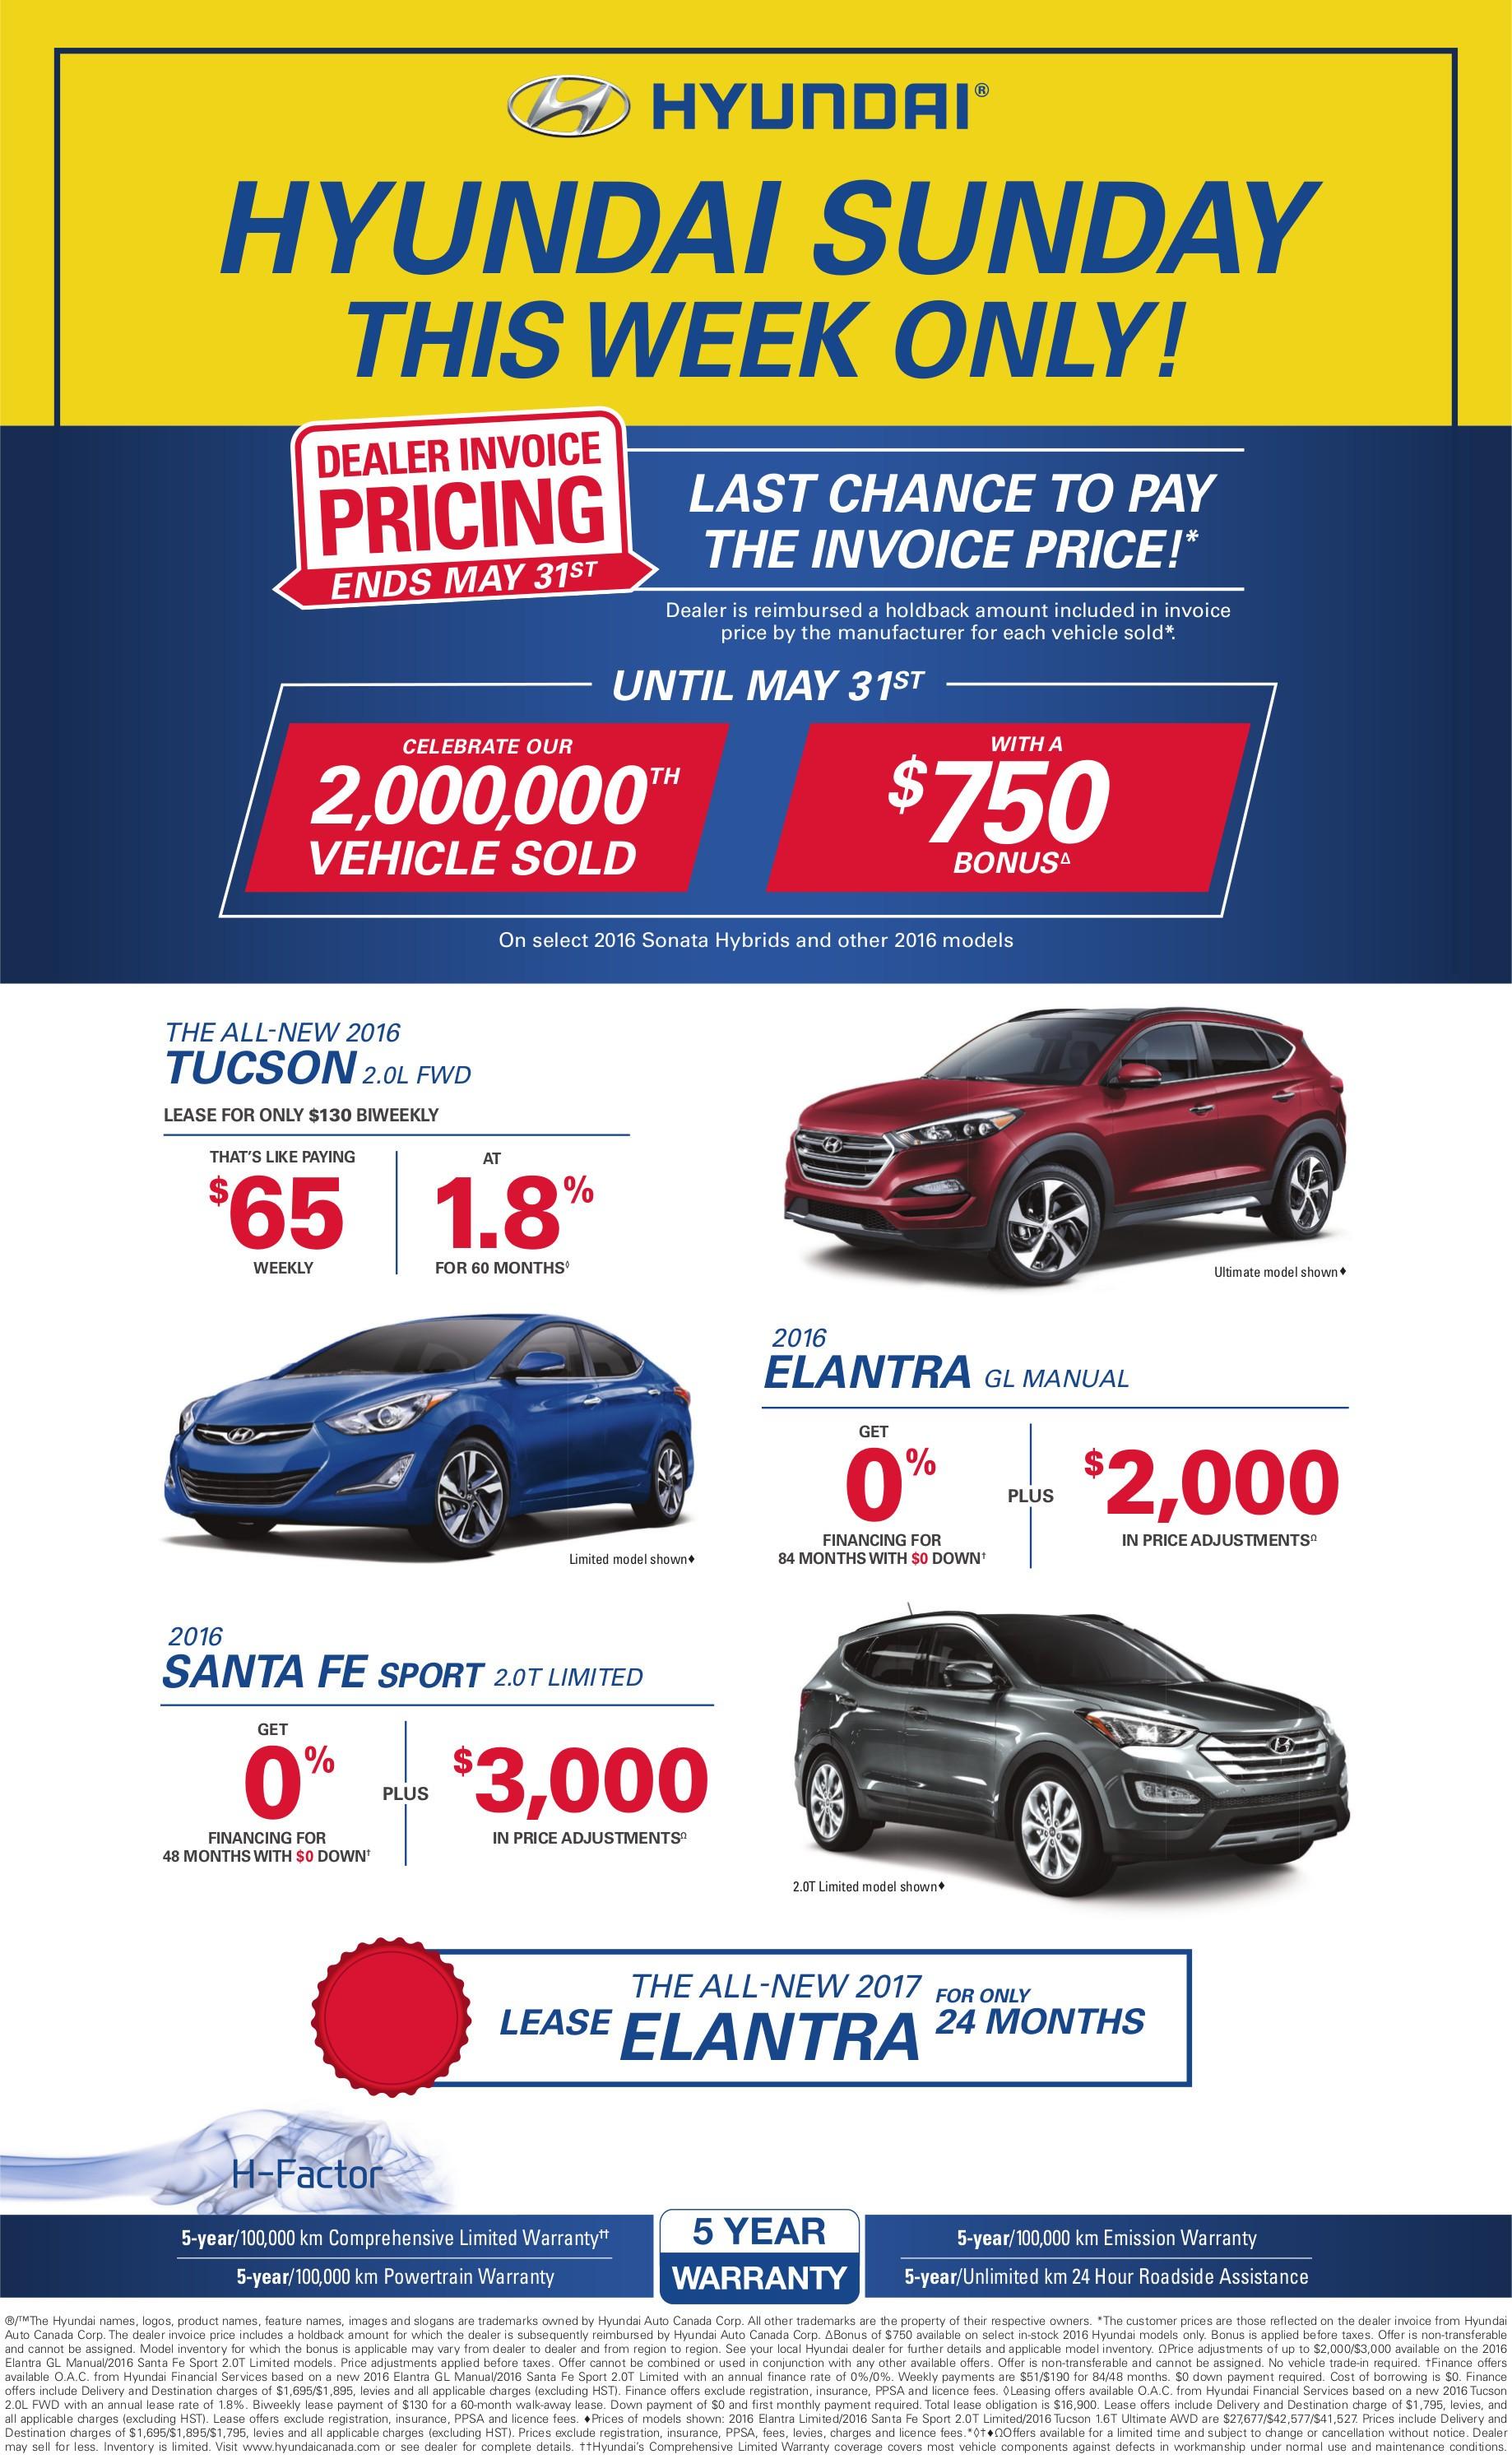 Hyundai Canada Incentives for the 2016 Elantra, Accent, Sonata, Tucson, and Santa Fe in Milton, Toronto, and the GTA